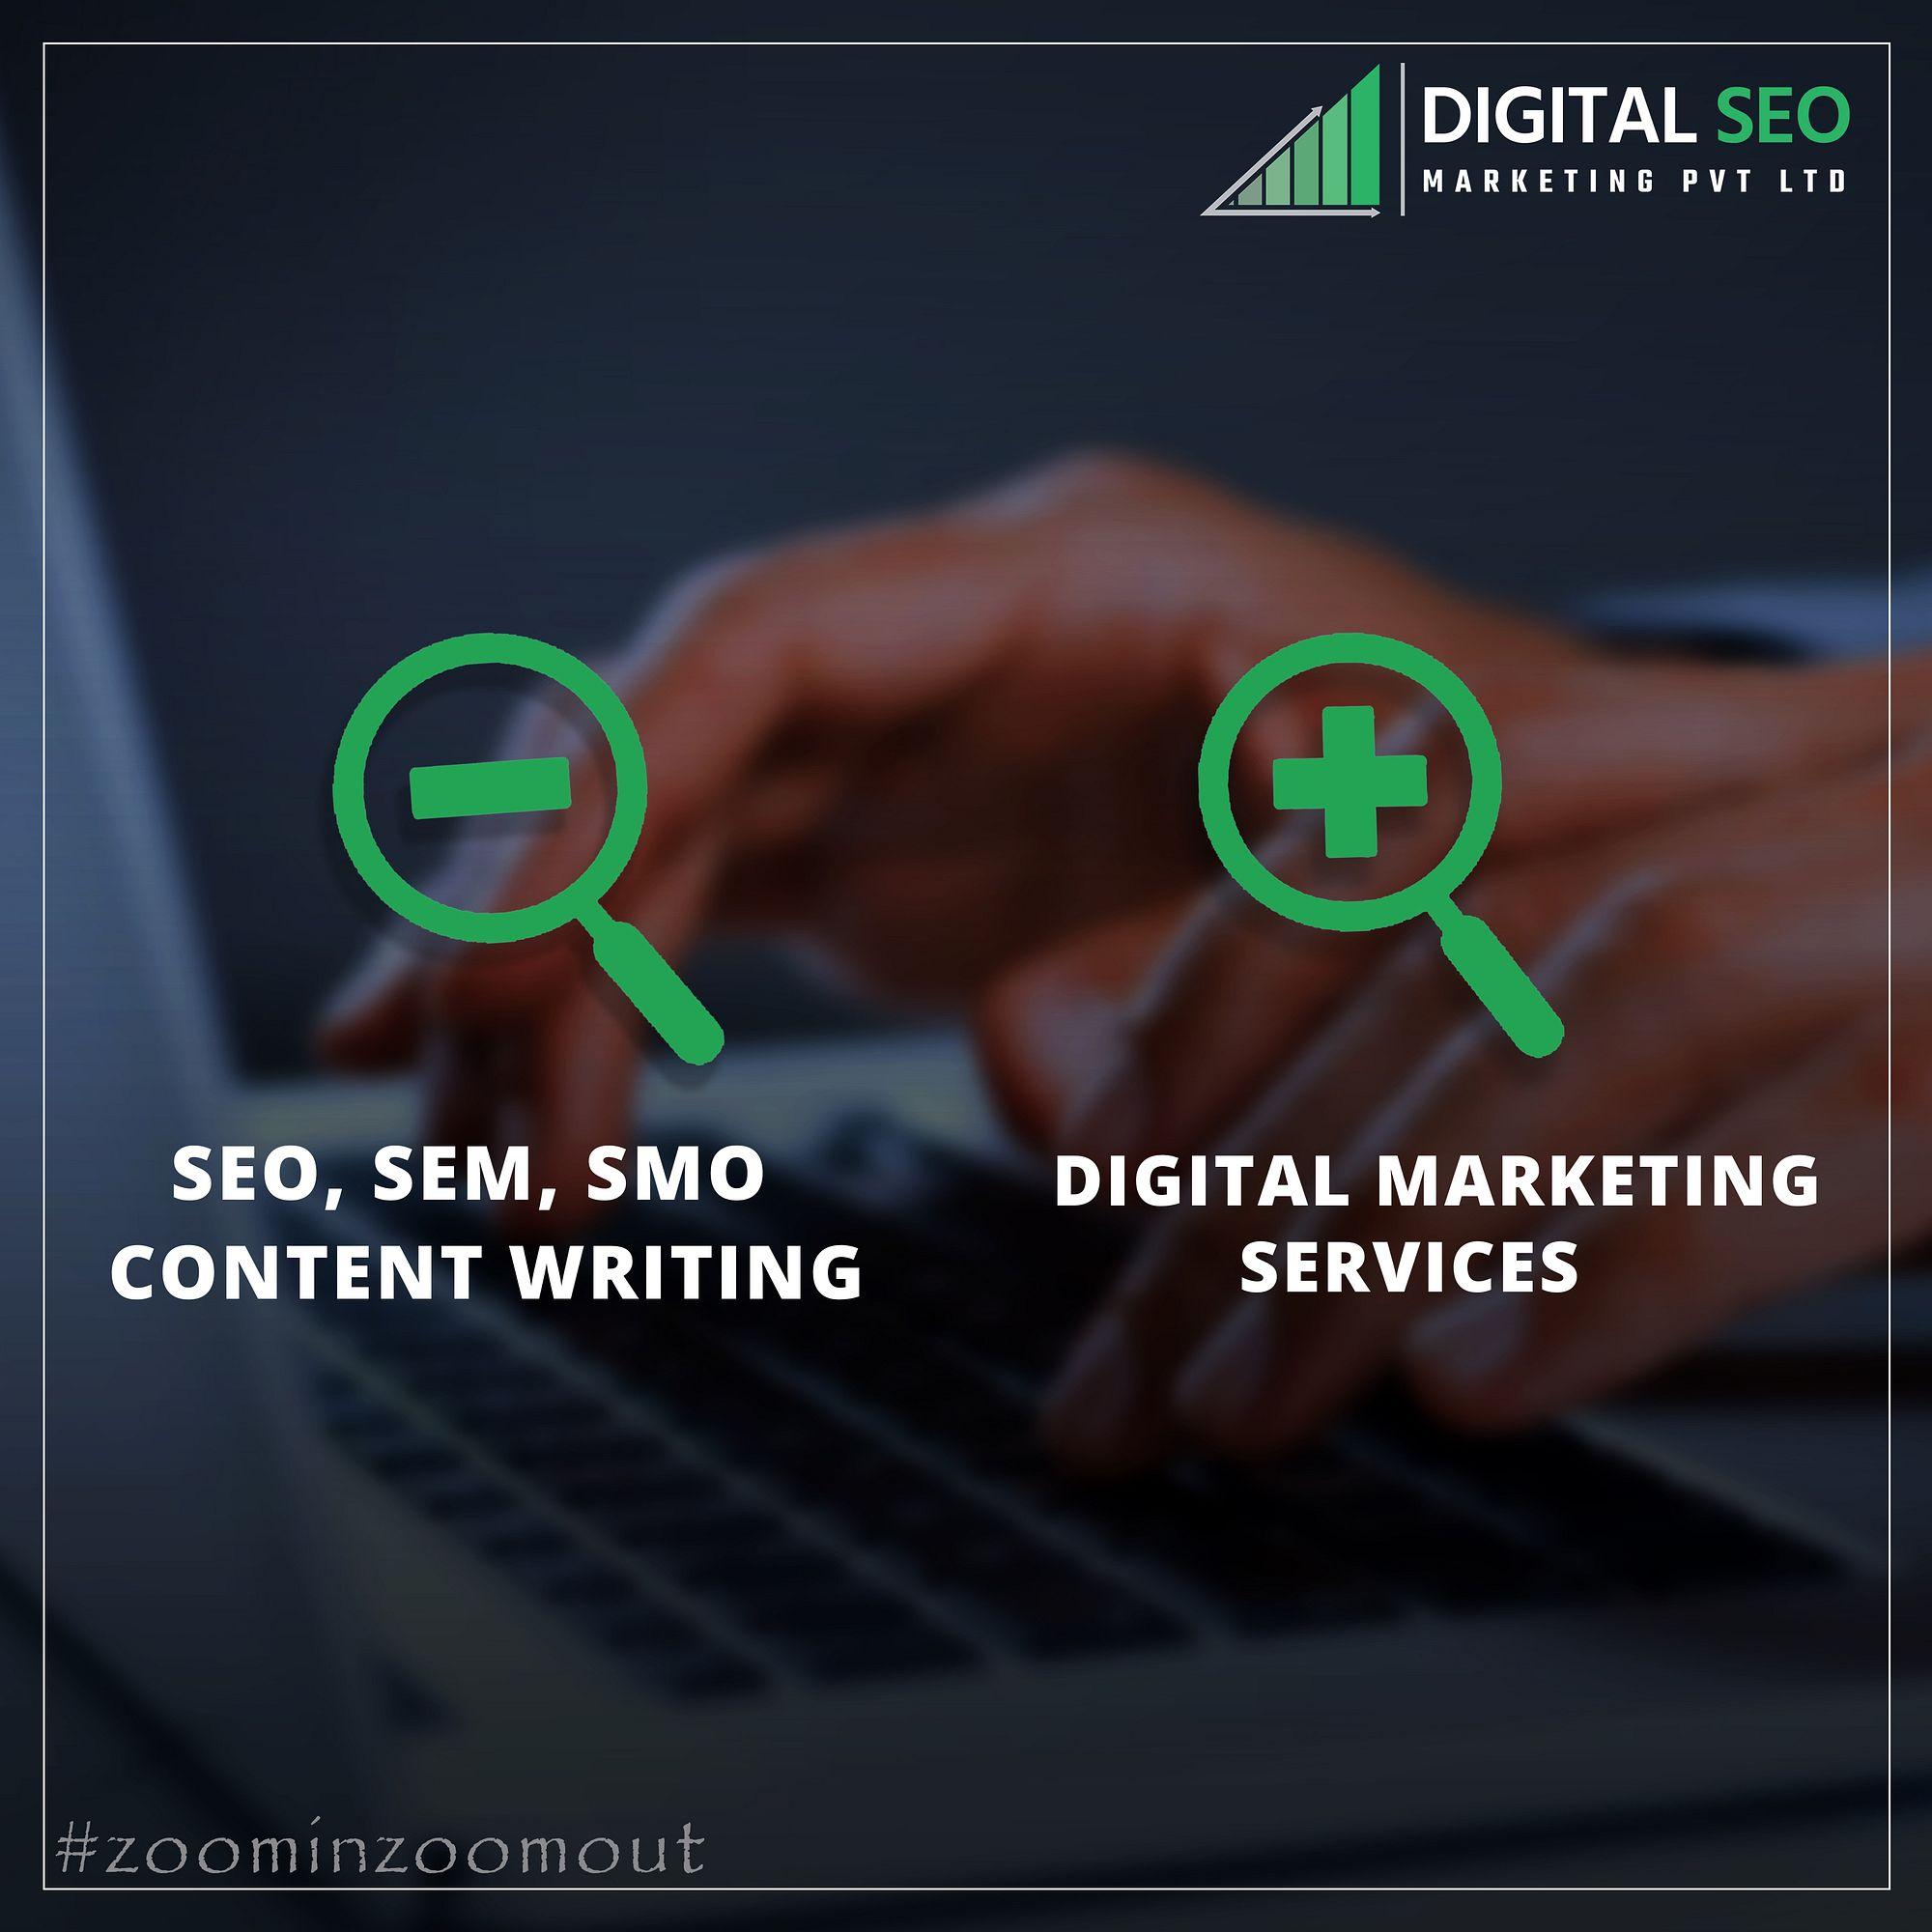 Digital seo offers you professional digital marketing